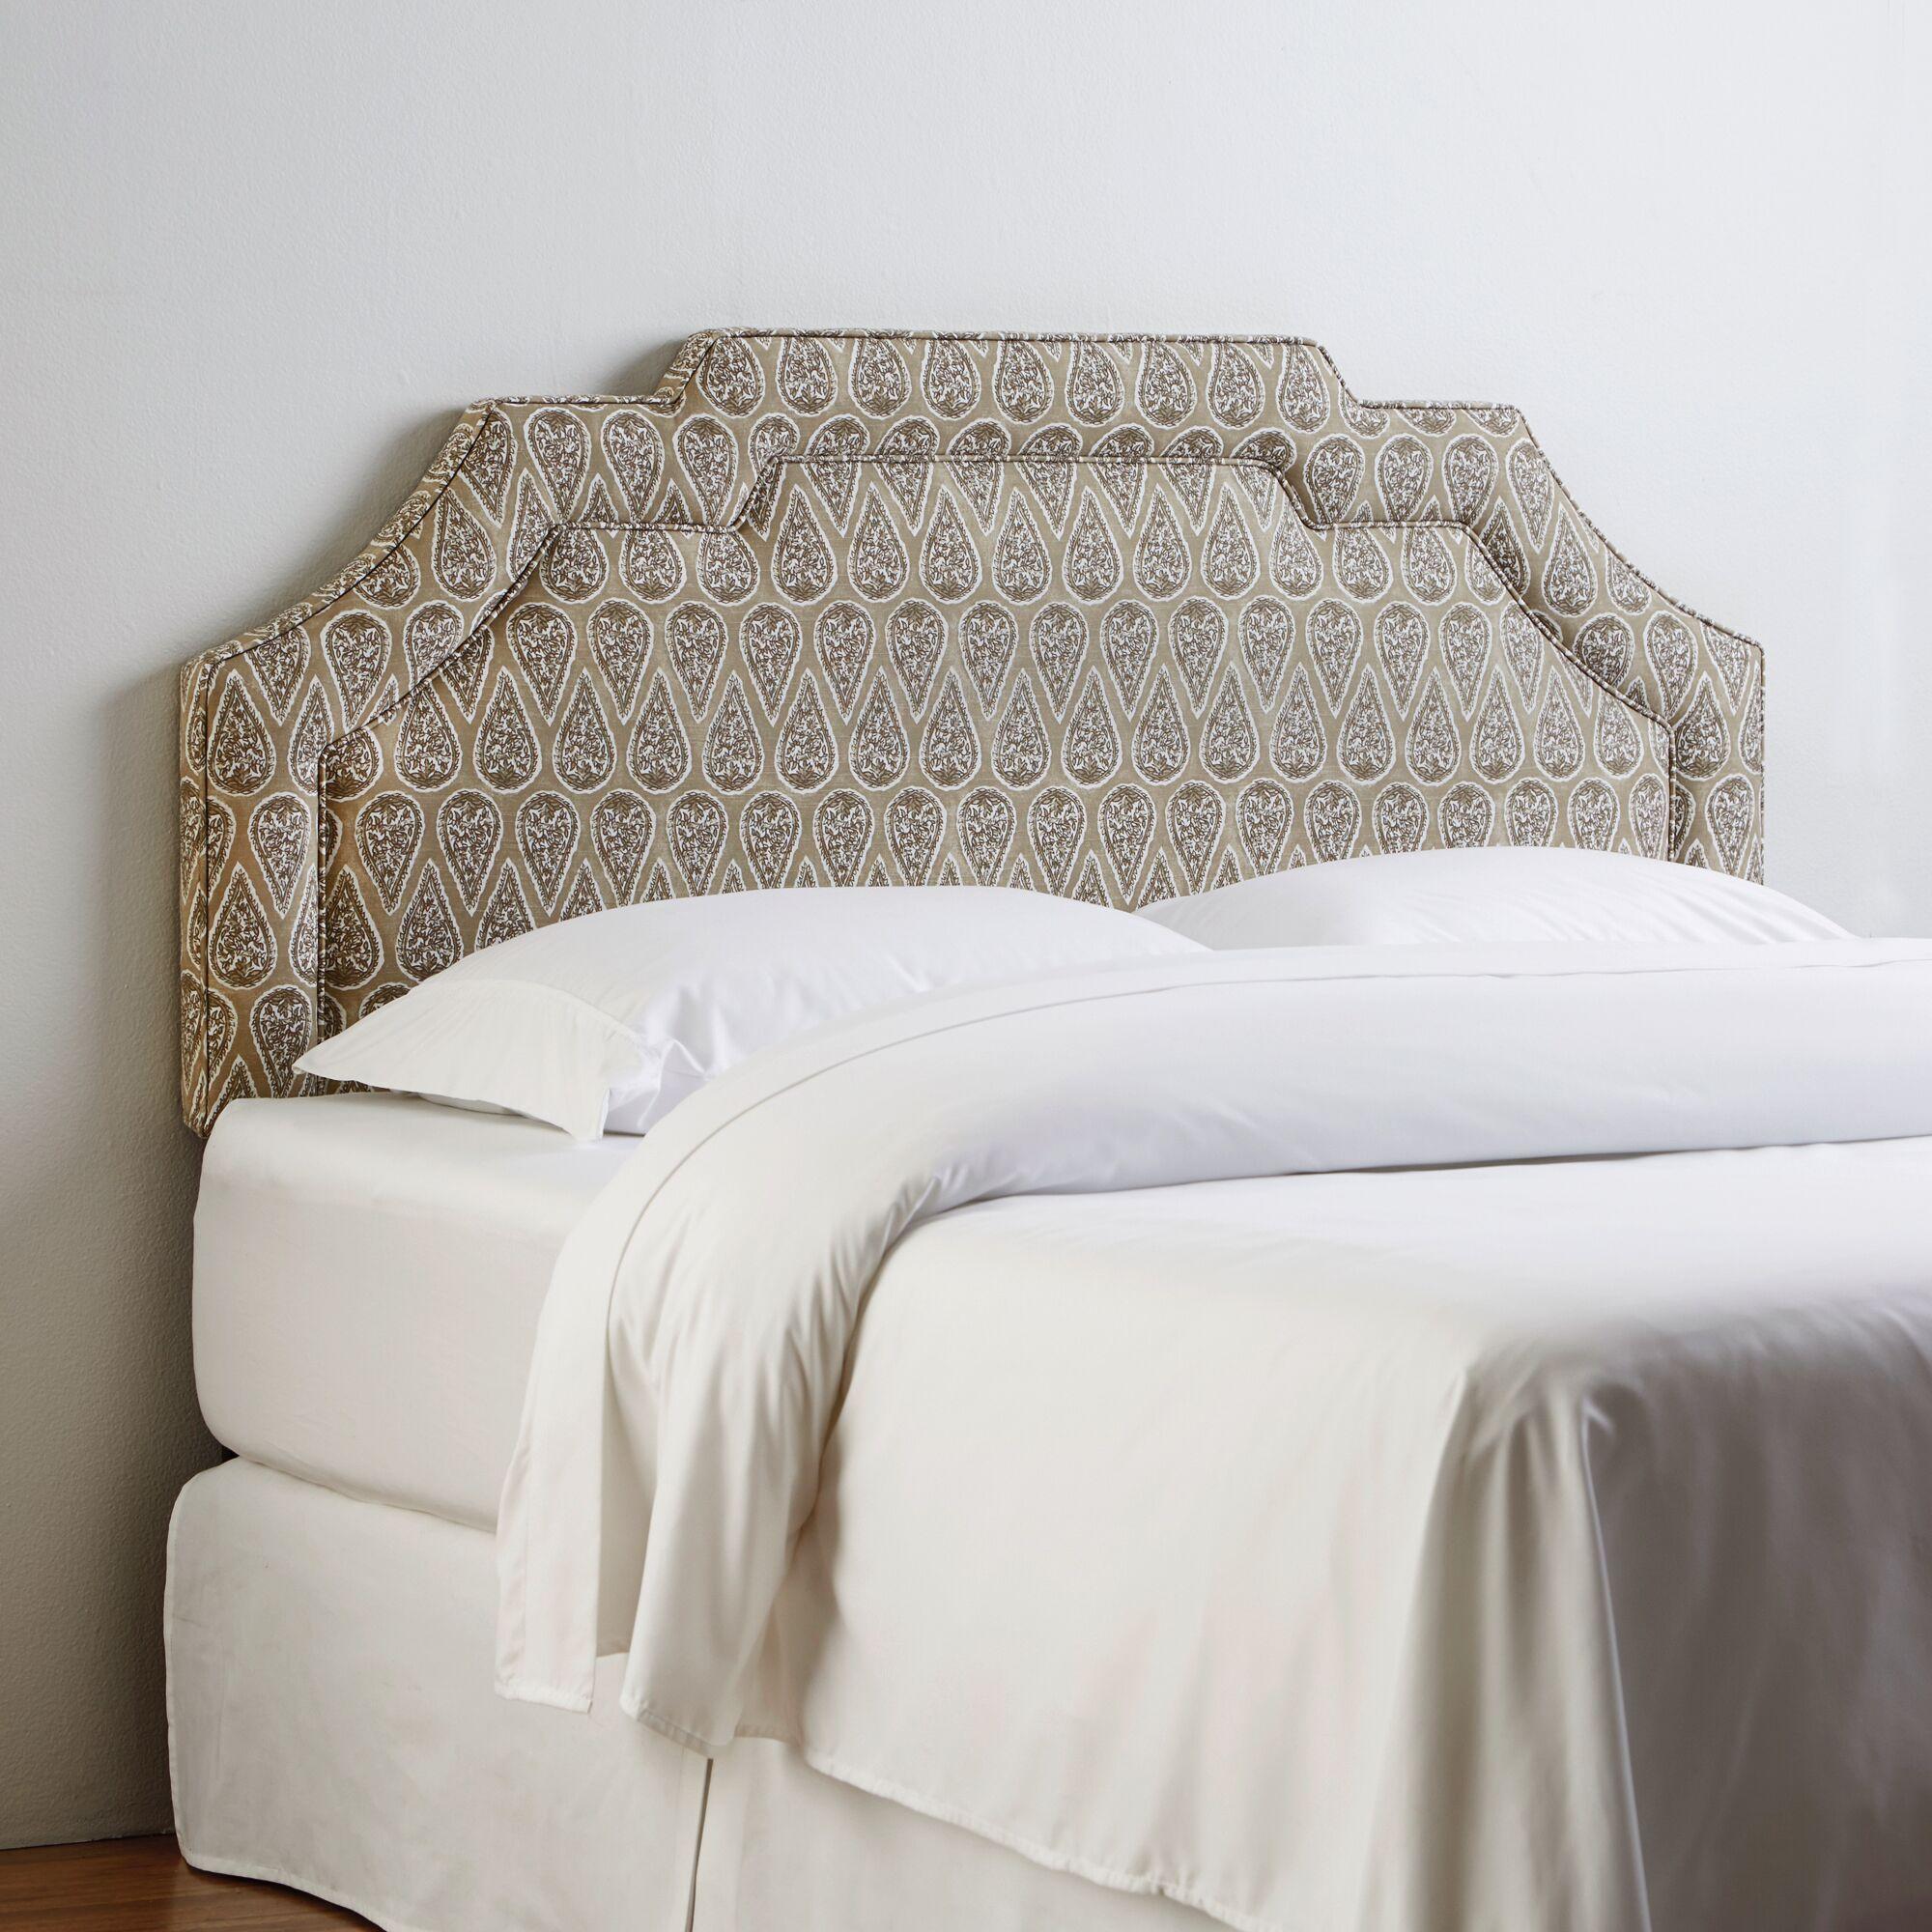 Keeling Upholstered Headboard Upholstery: Marlow Midnight, Size: Full